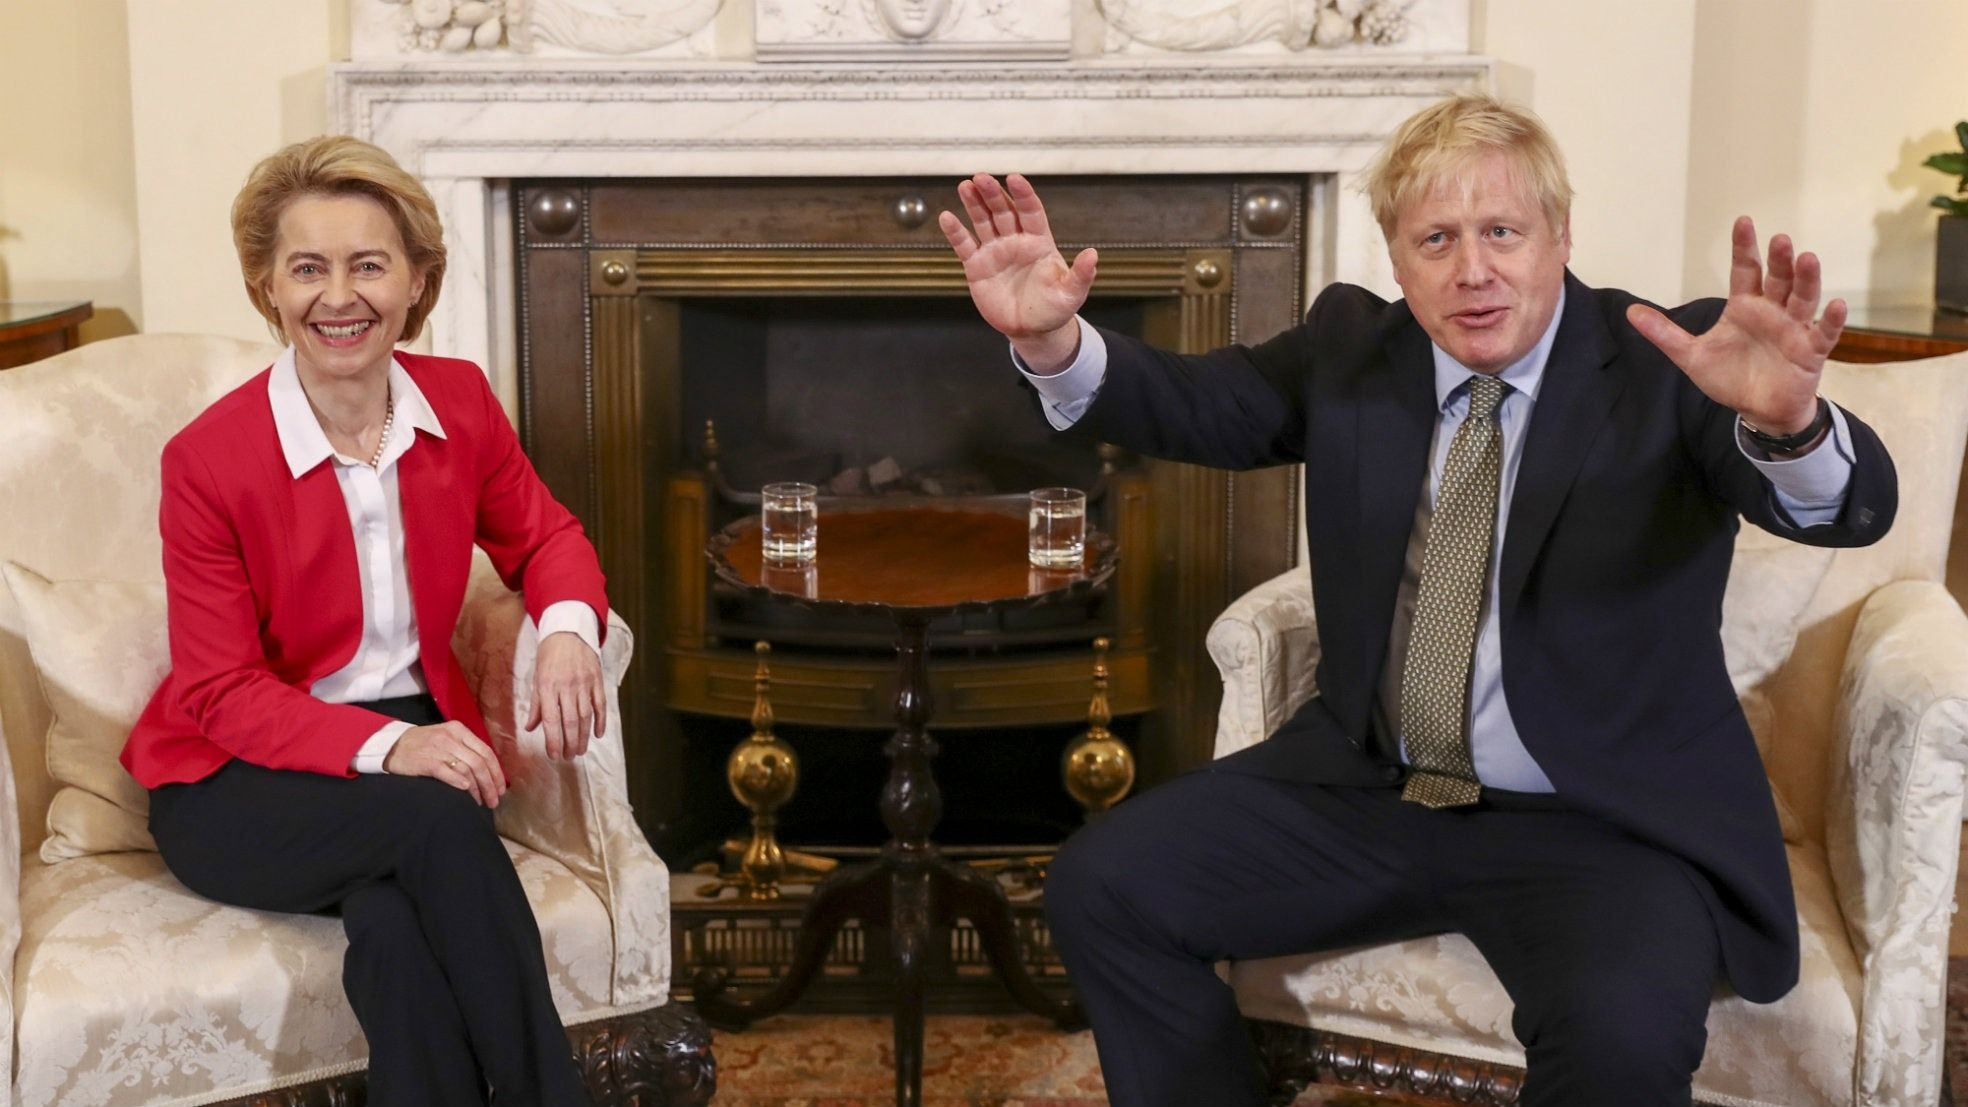 Vonder Leyen Johnson Downingstreet Brexit